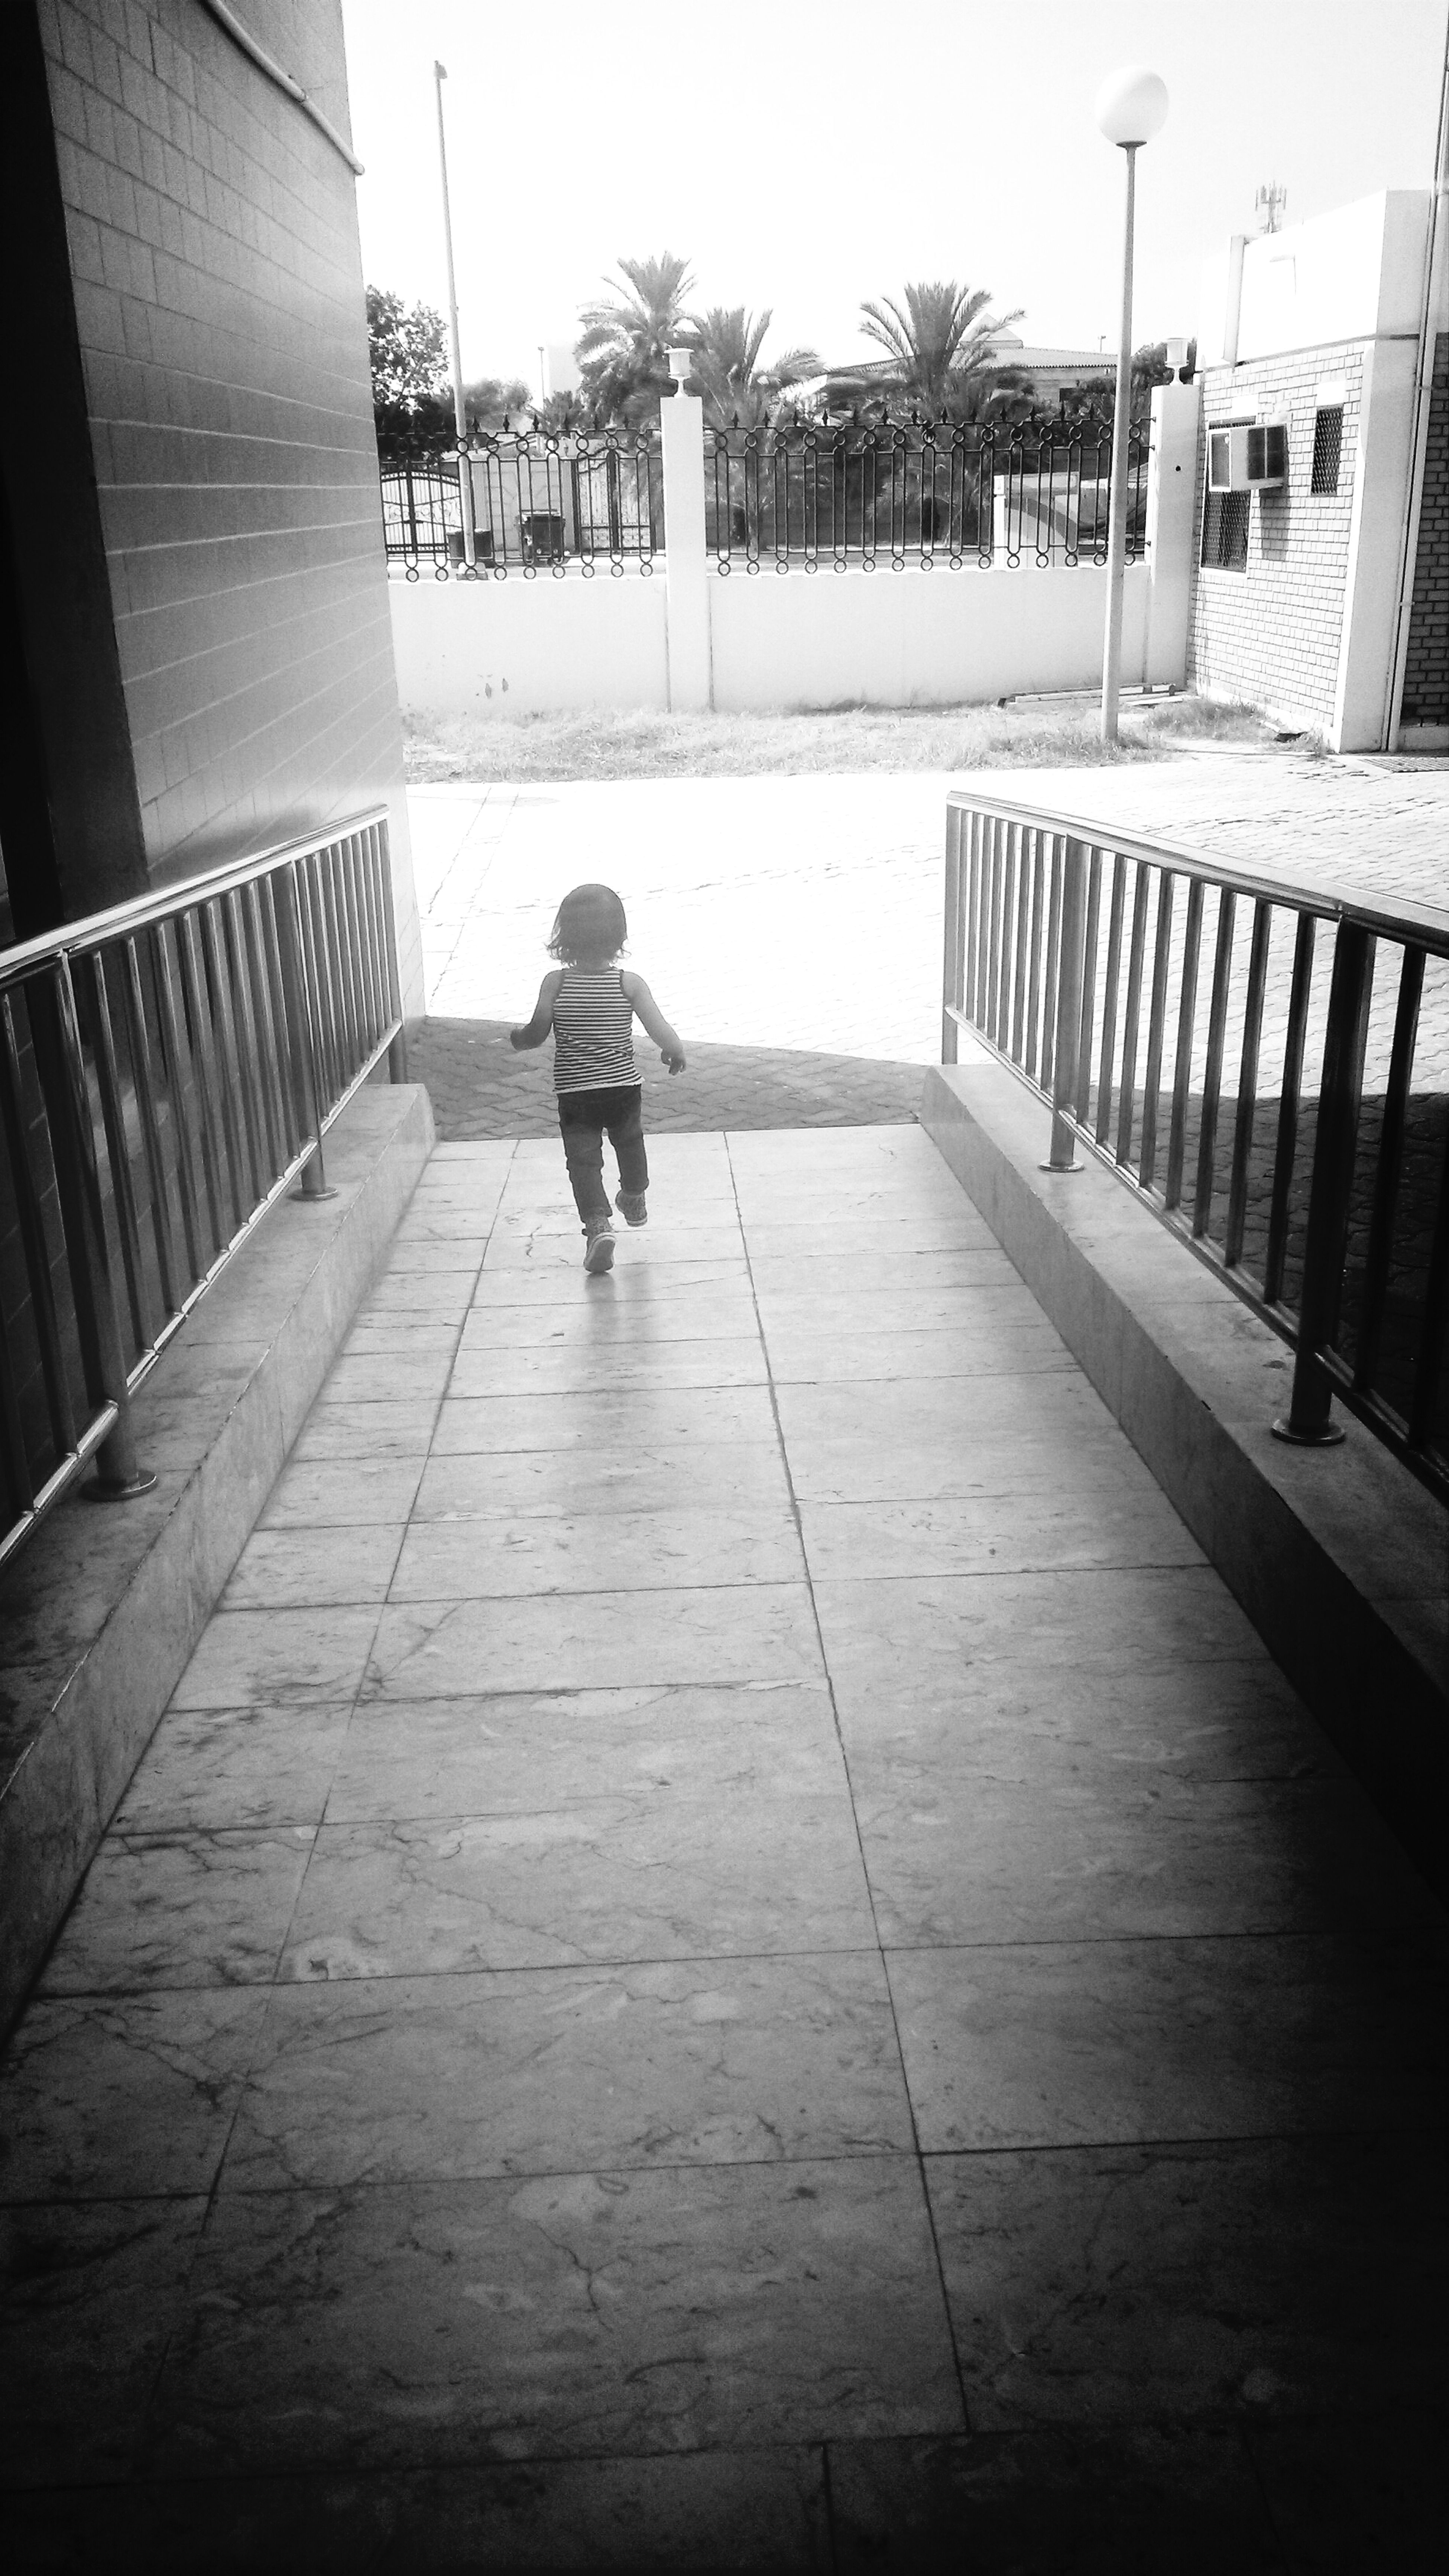 Streetphoto_bw Runawaybaby Jeans Black&white